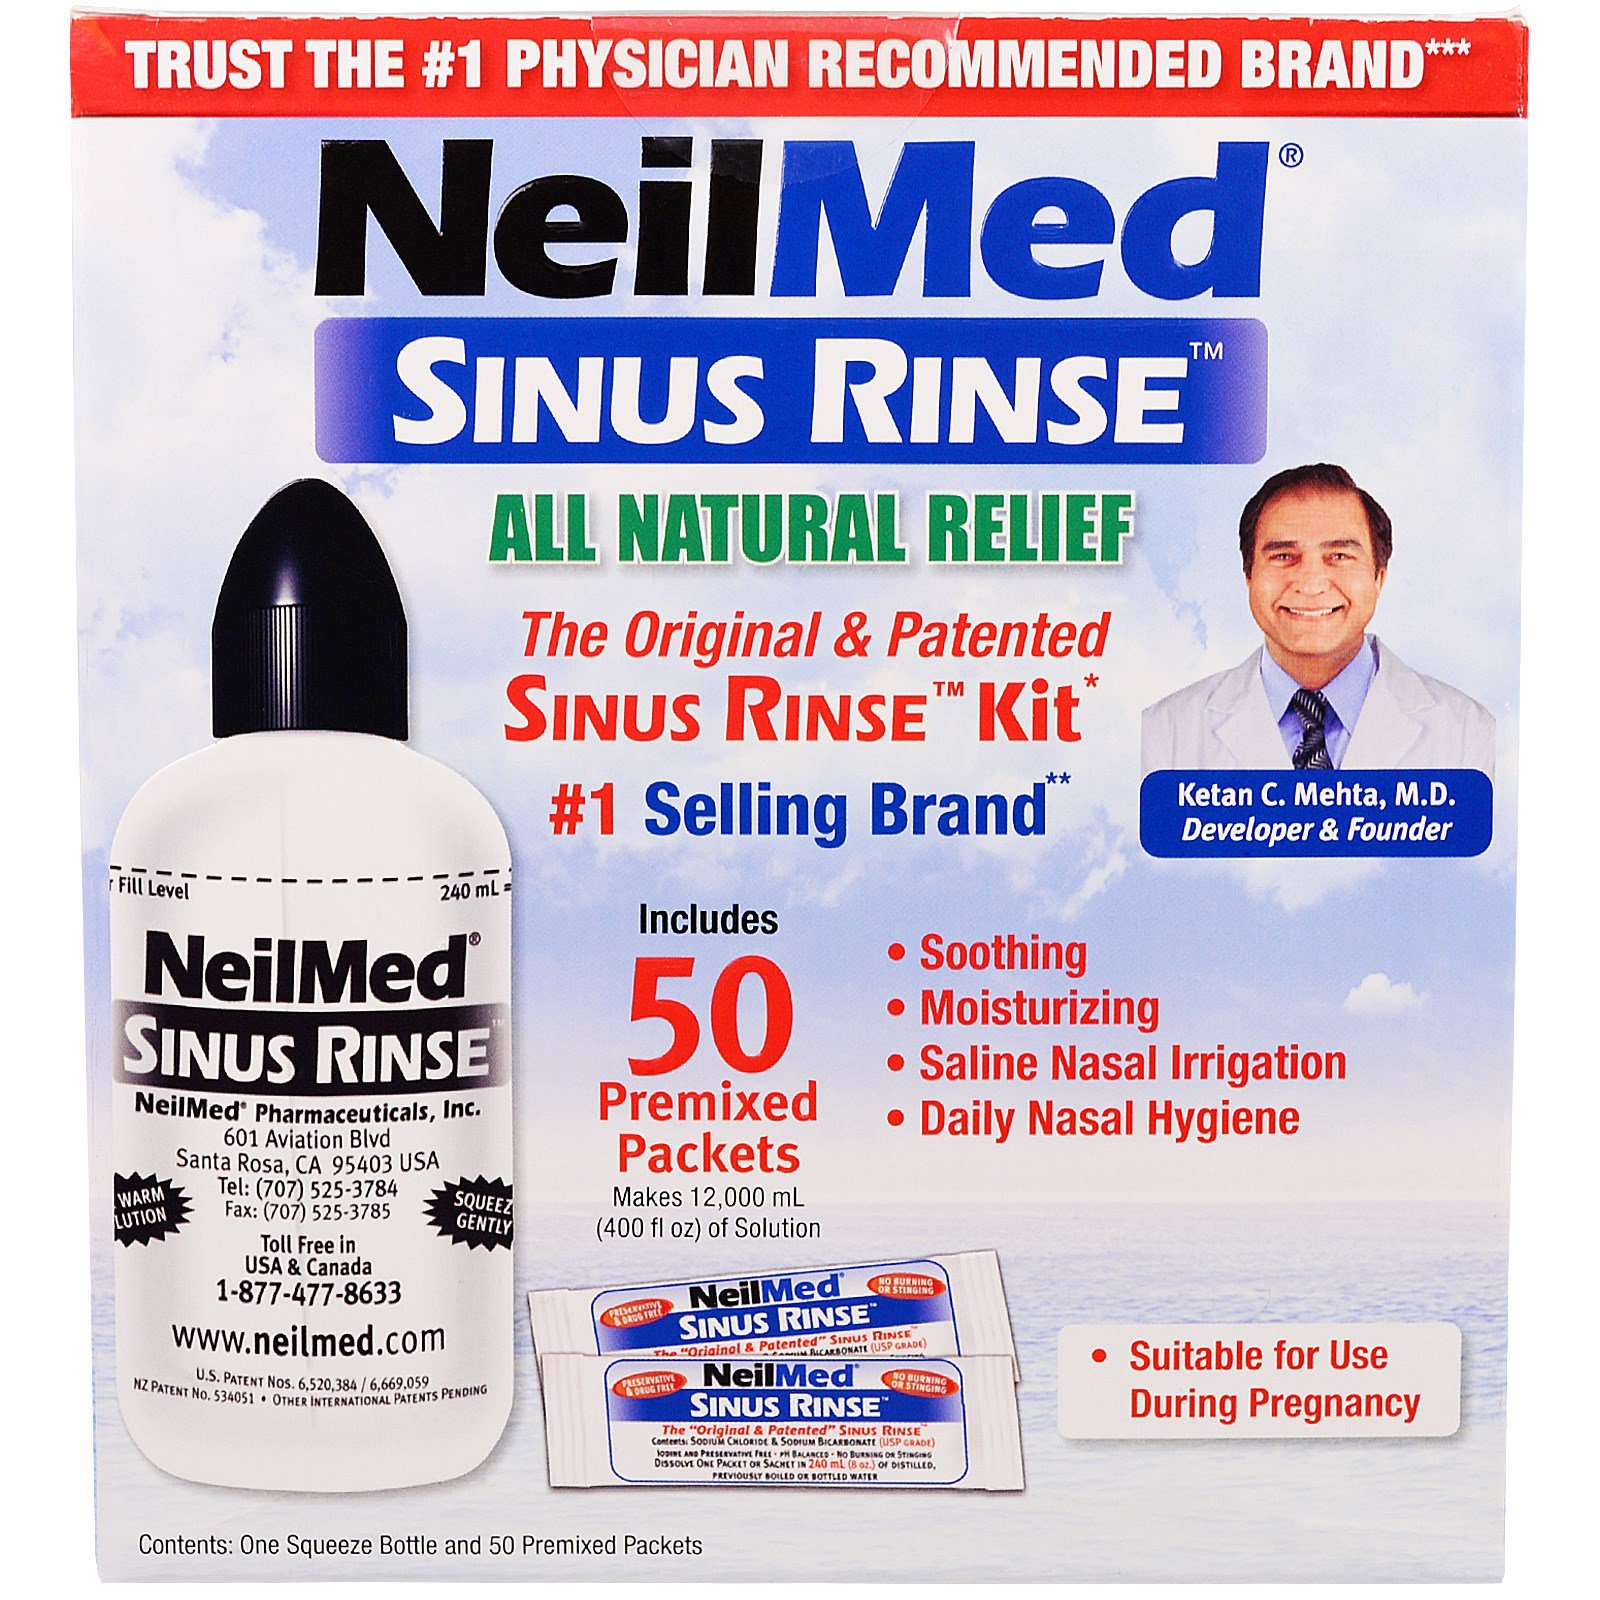 NeilMed, The Original & Patented Sinus Rinse Kit, 50